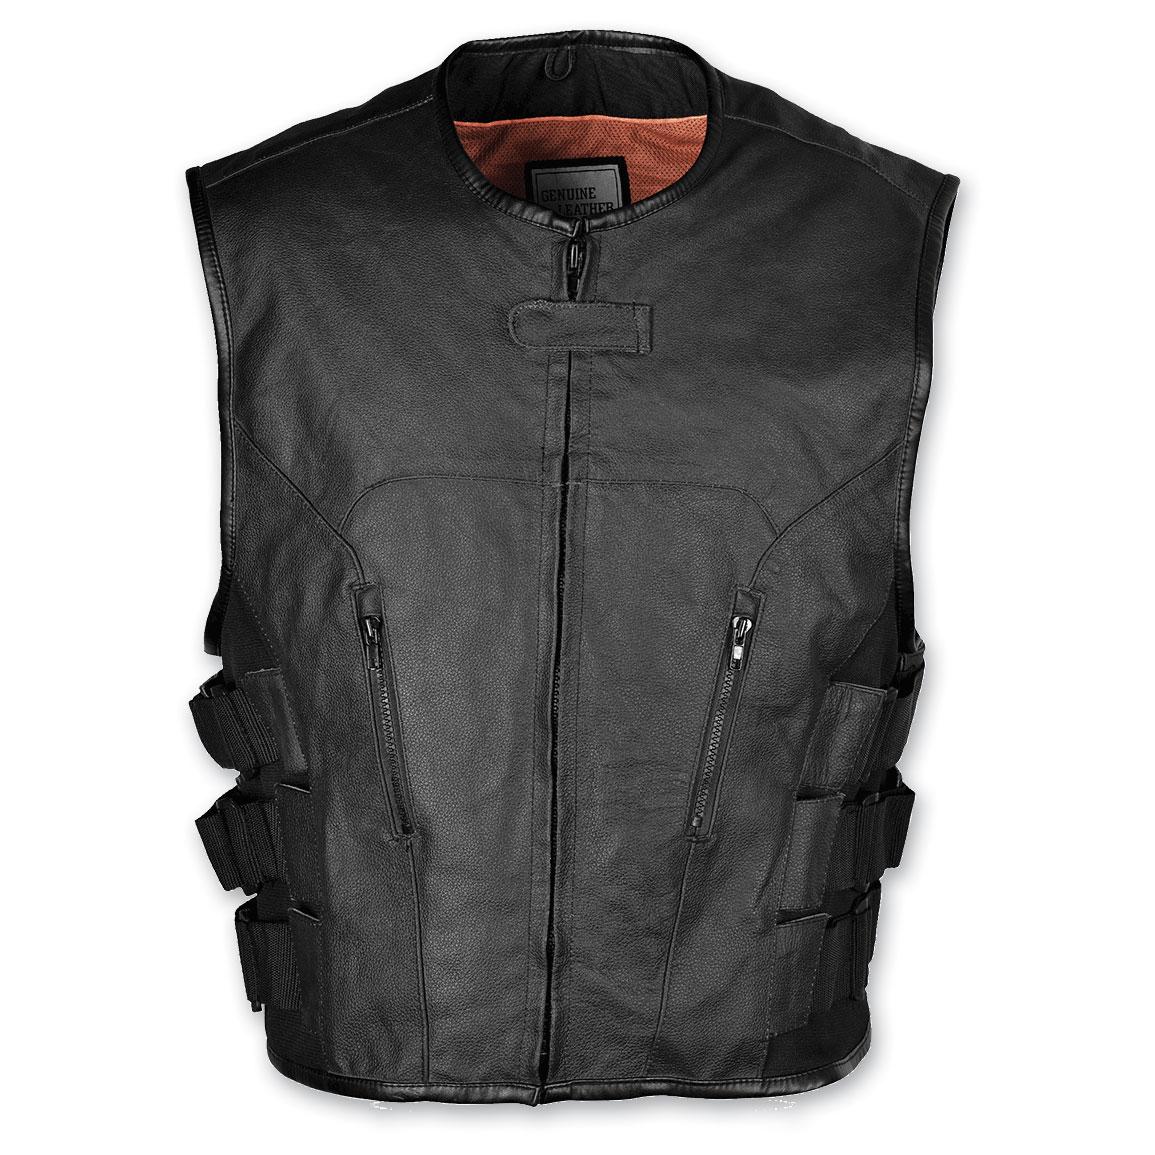 Vance Leathers Men's Tactical Style Black Leather Vest